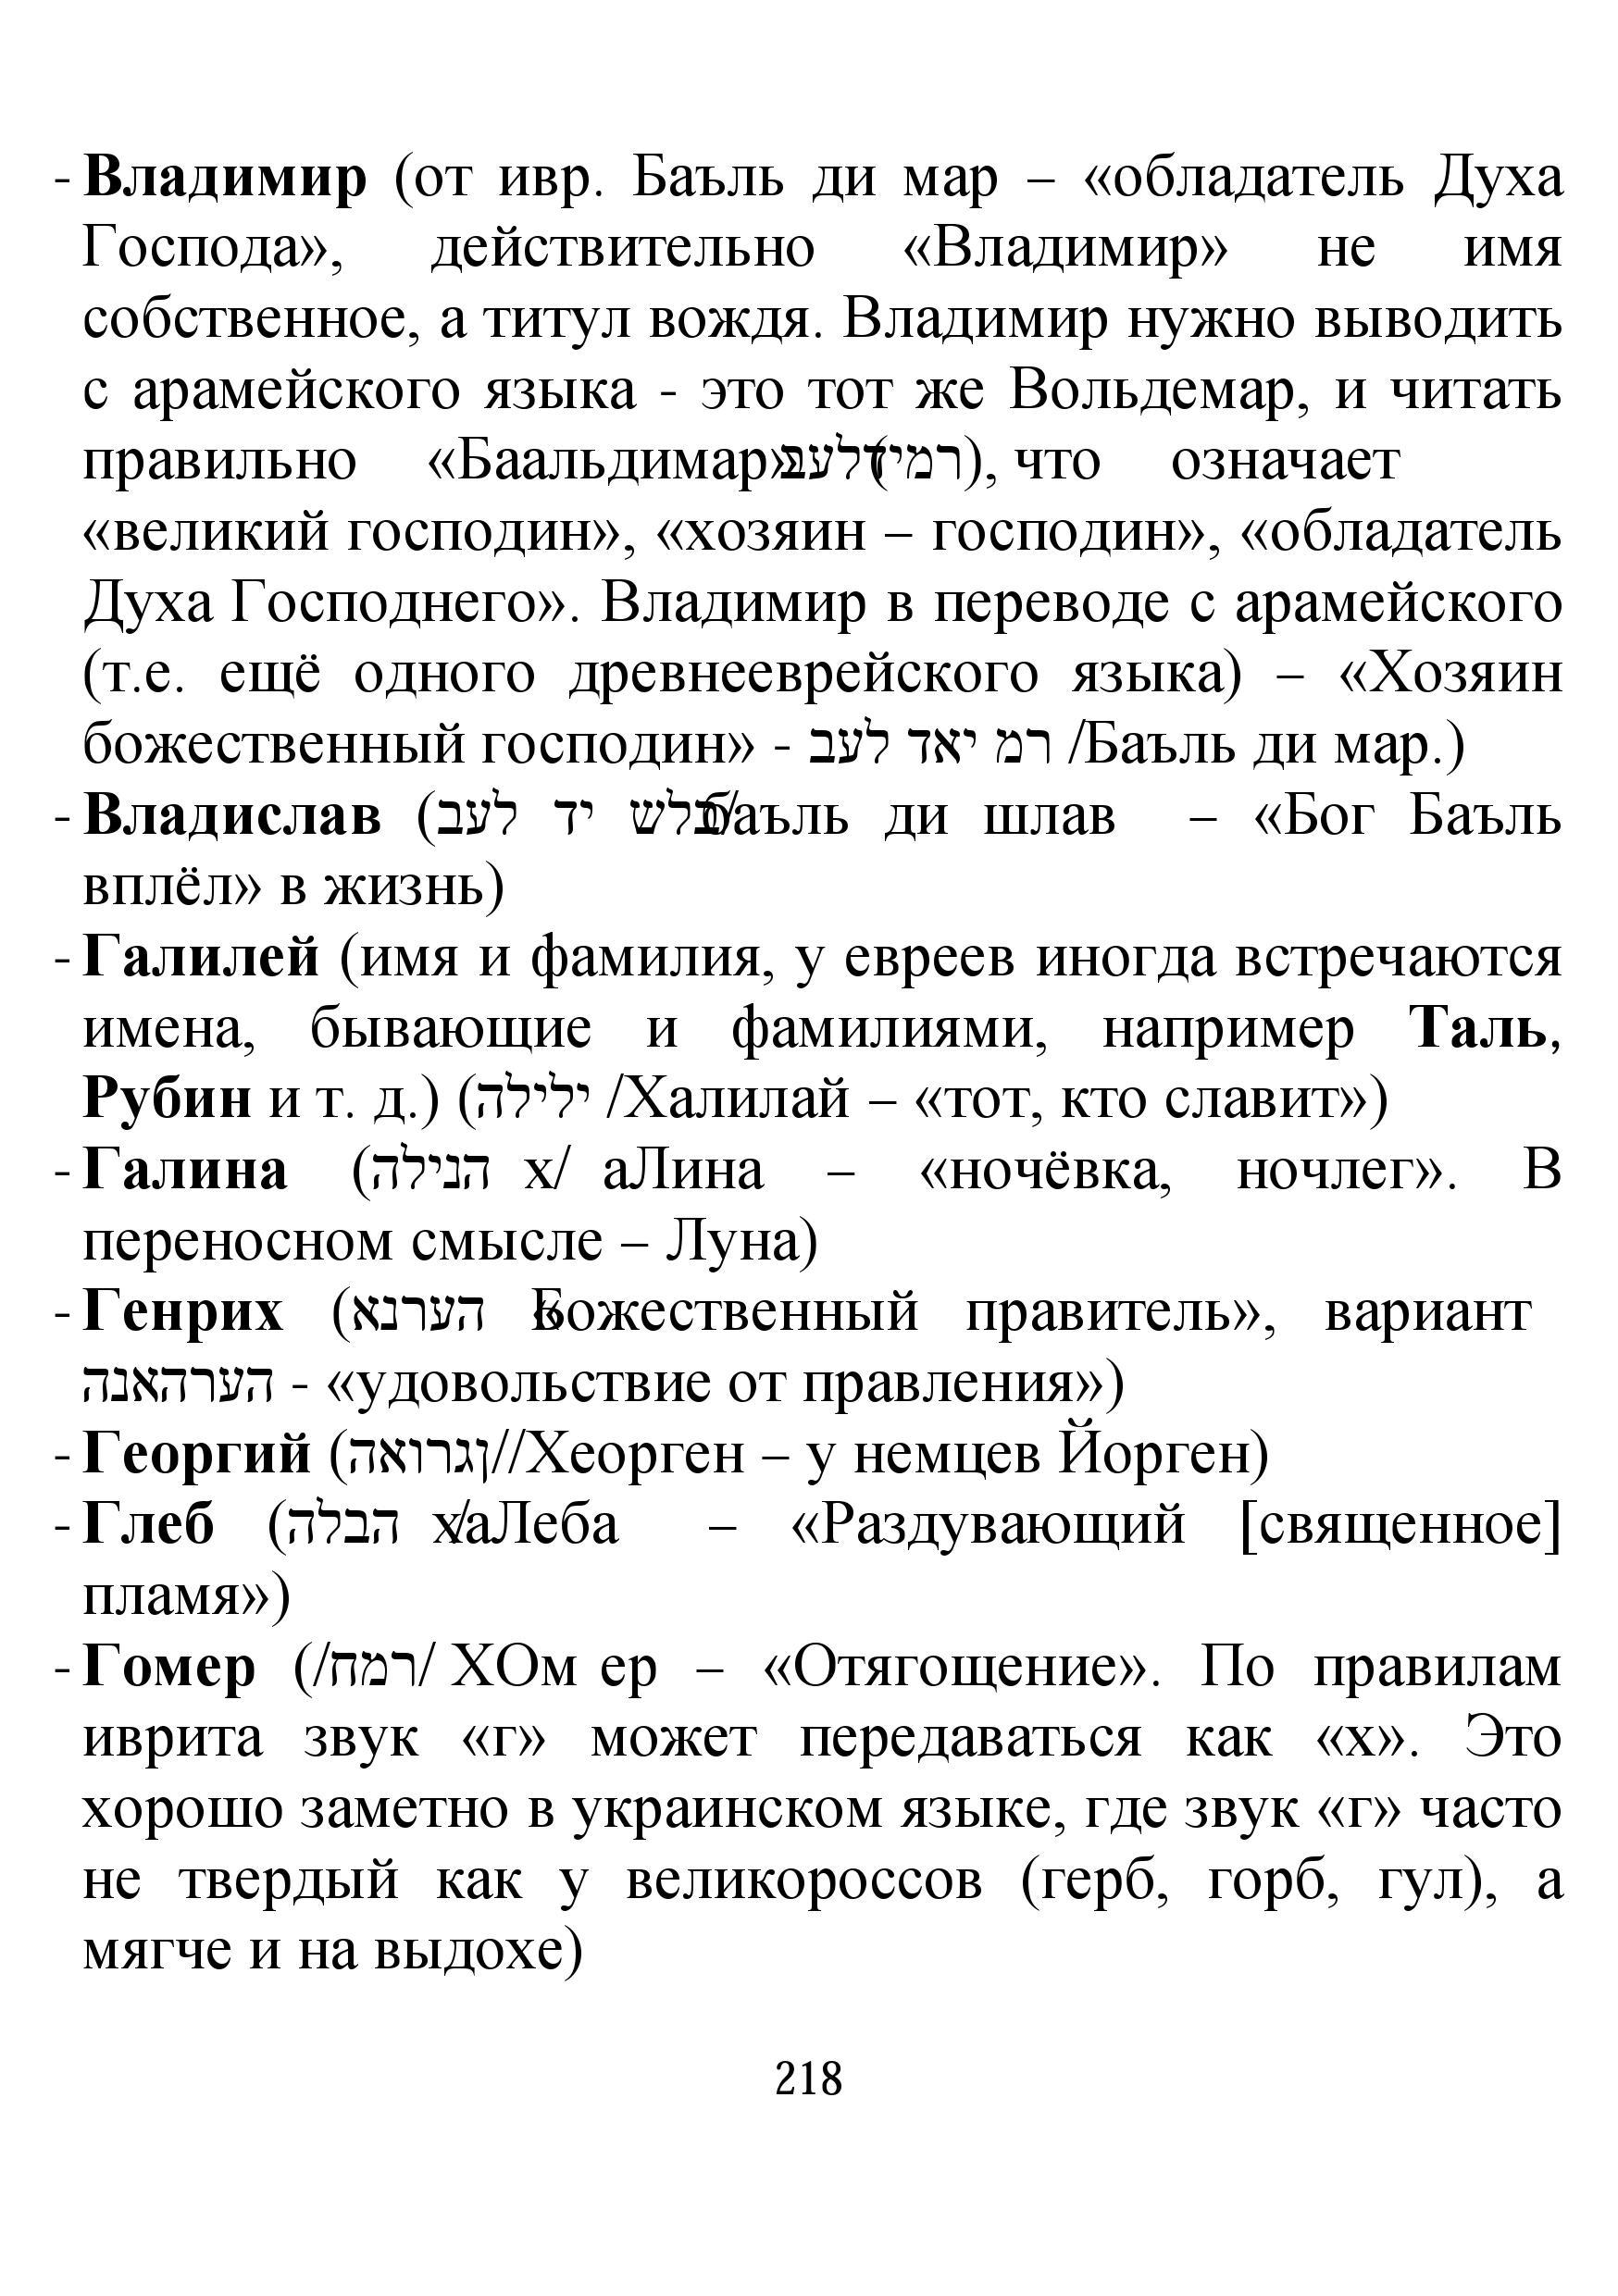 http://s1.uploads.ru/cVh0Z.jpg